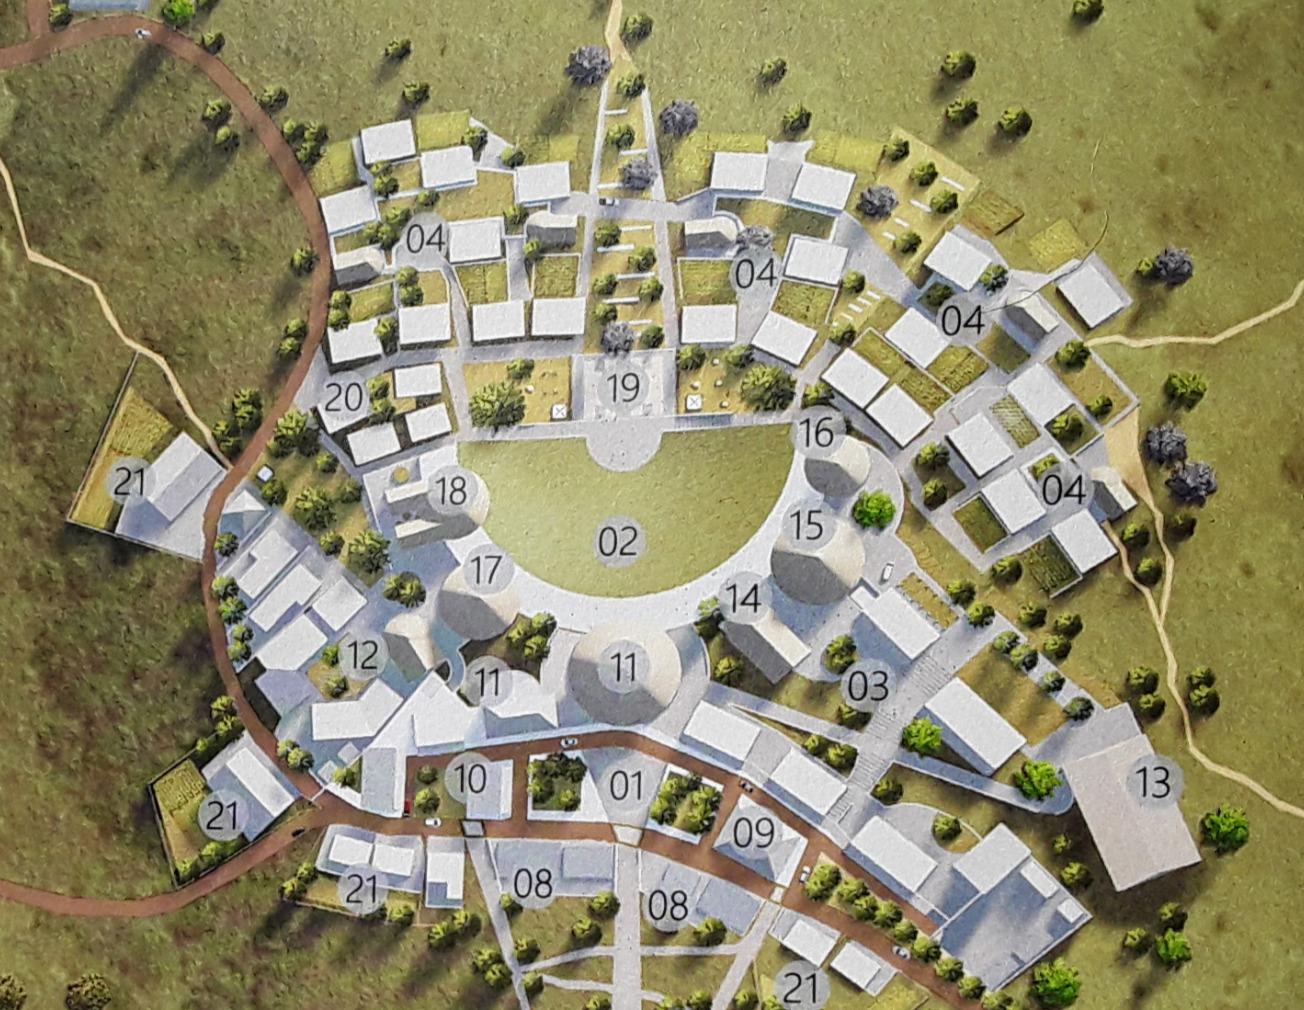 Vision - Entire Village